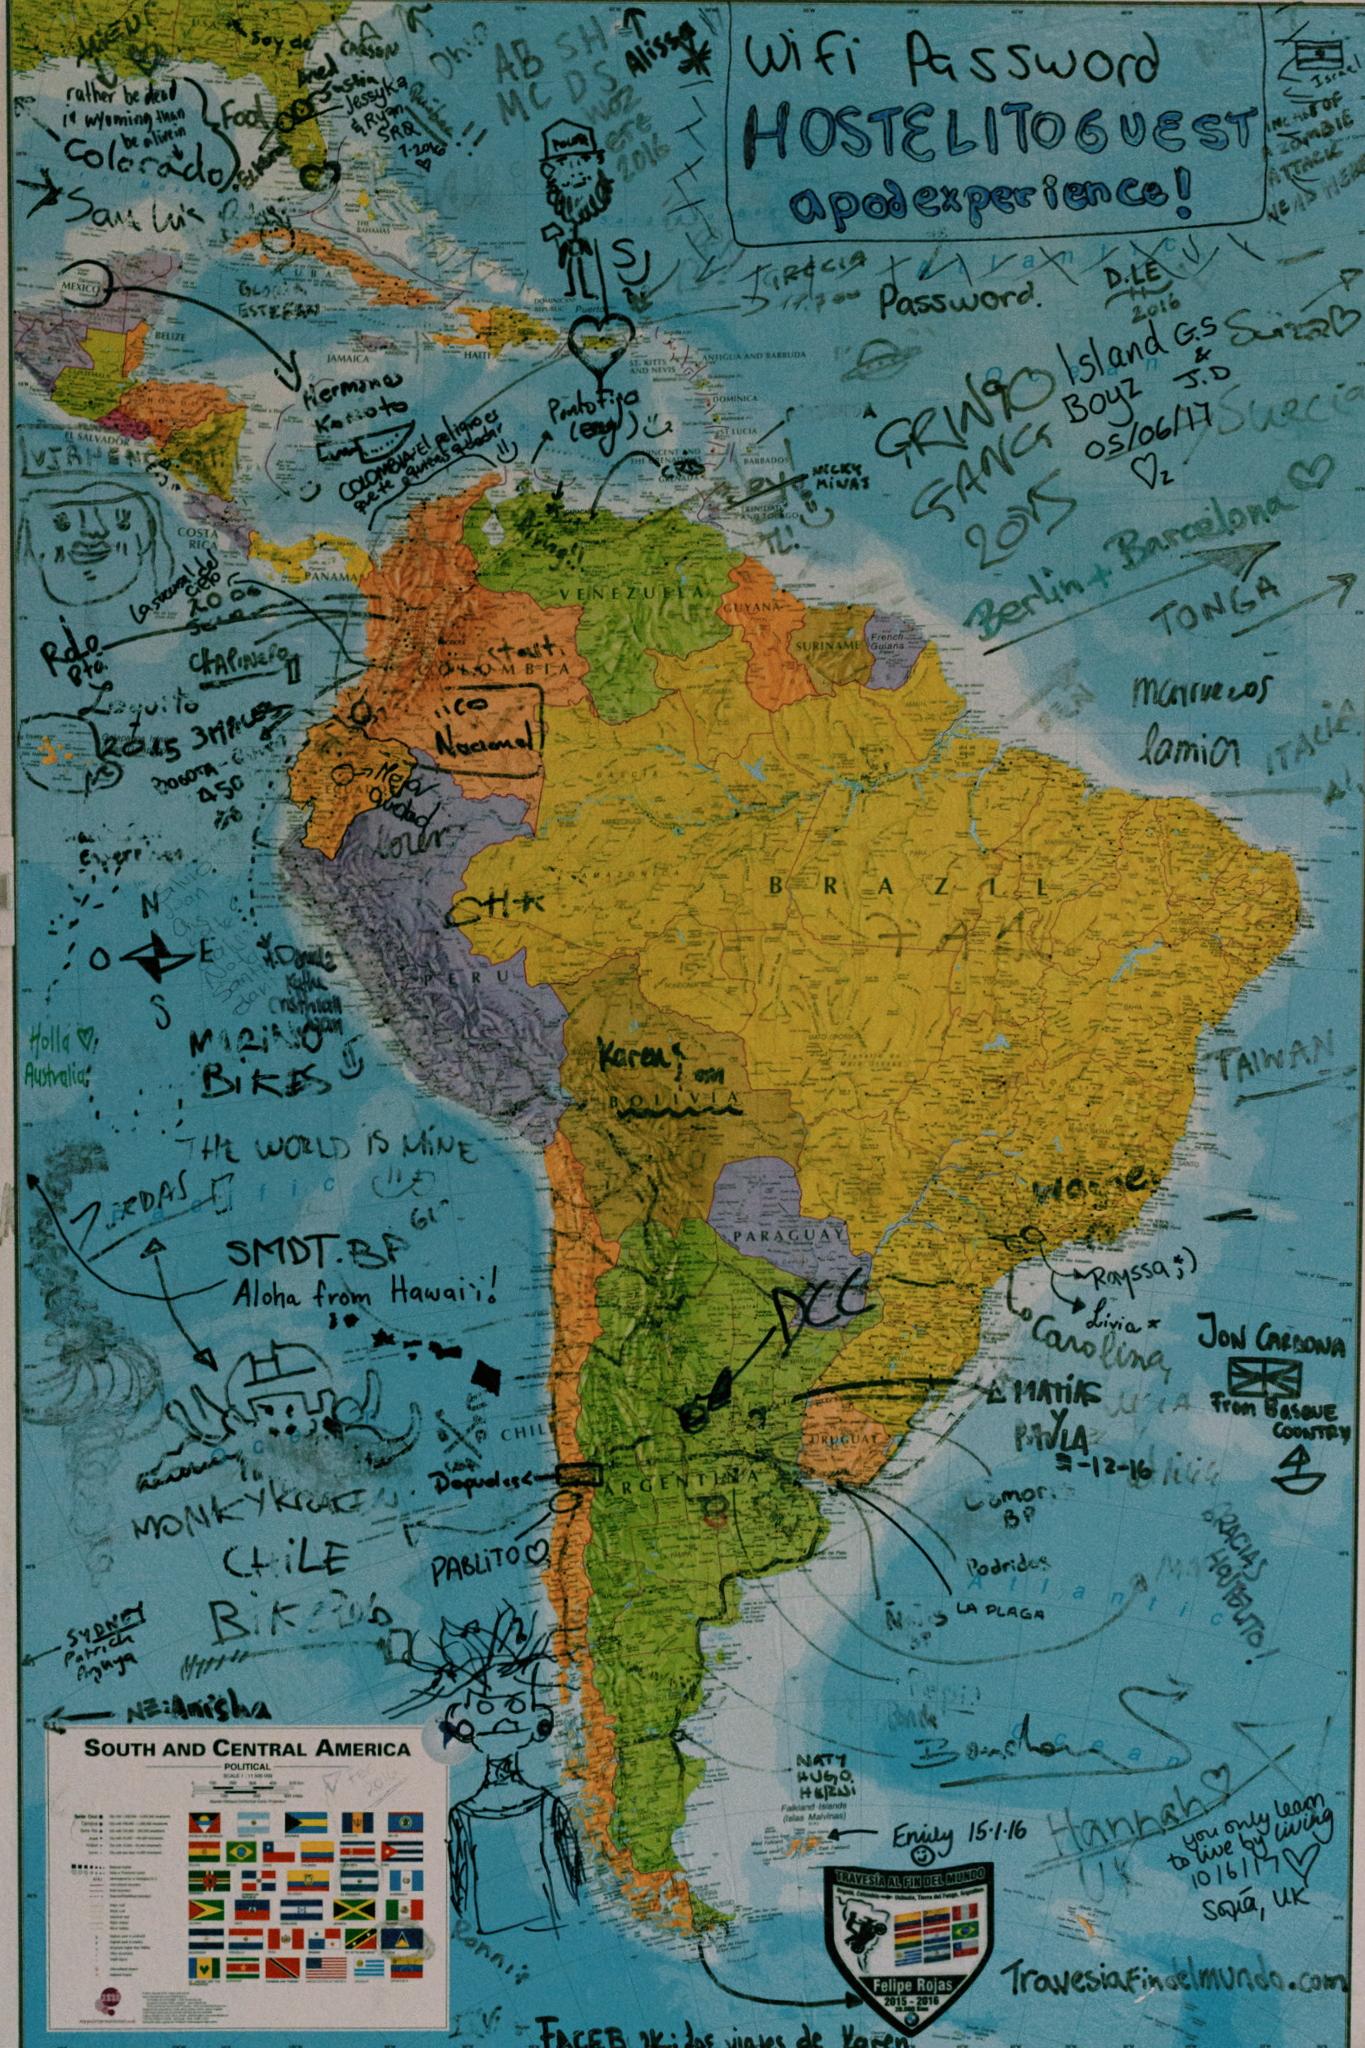 el mapa de hostalito hostalito quito pichincha